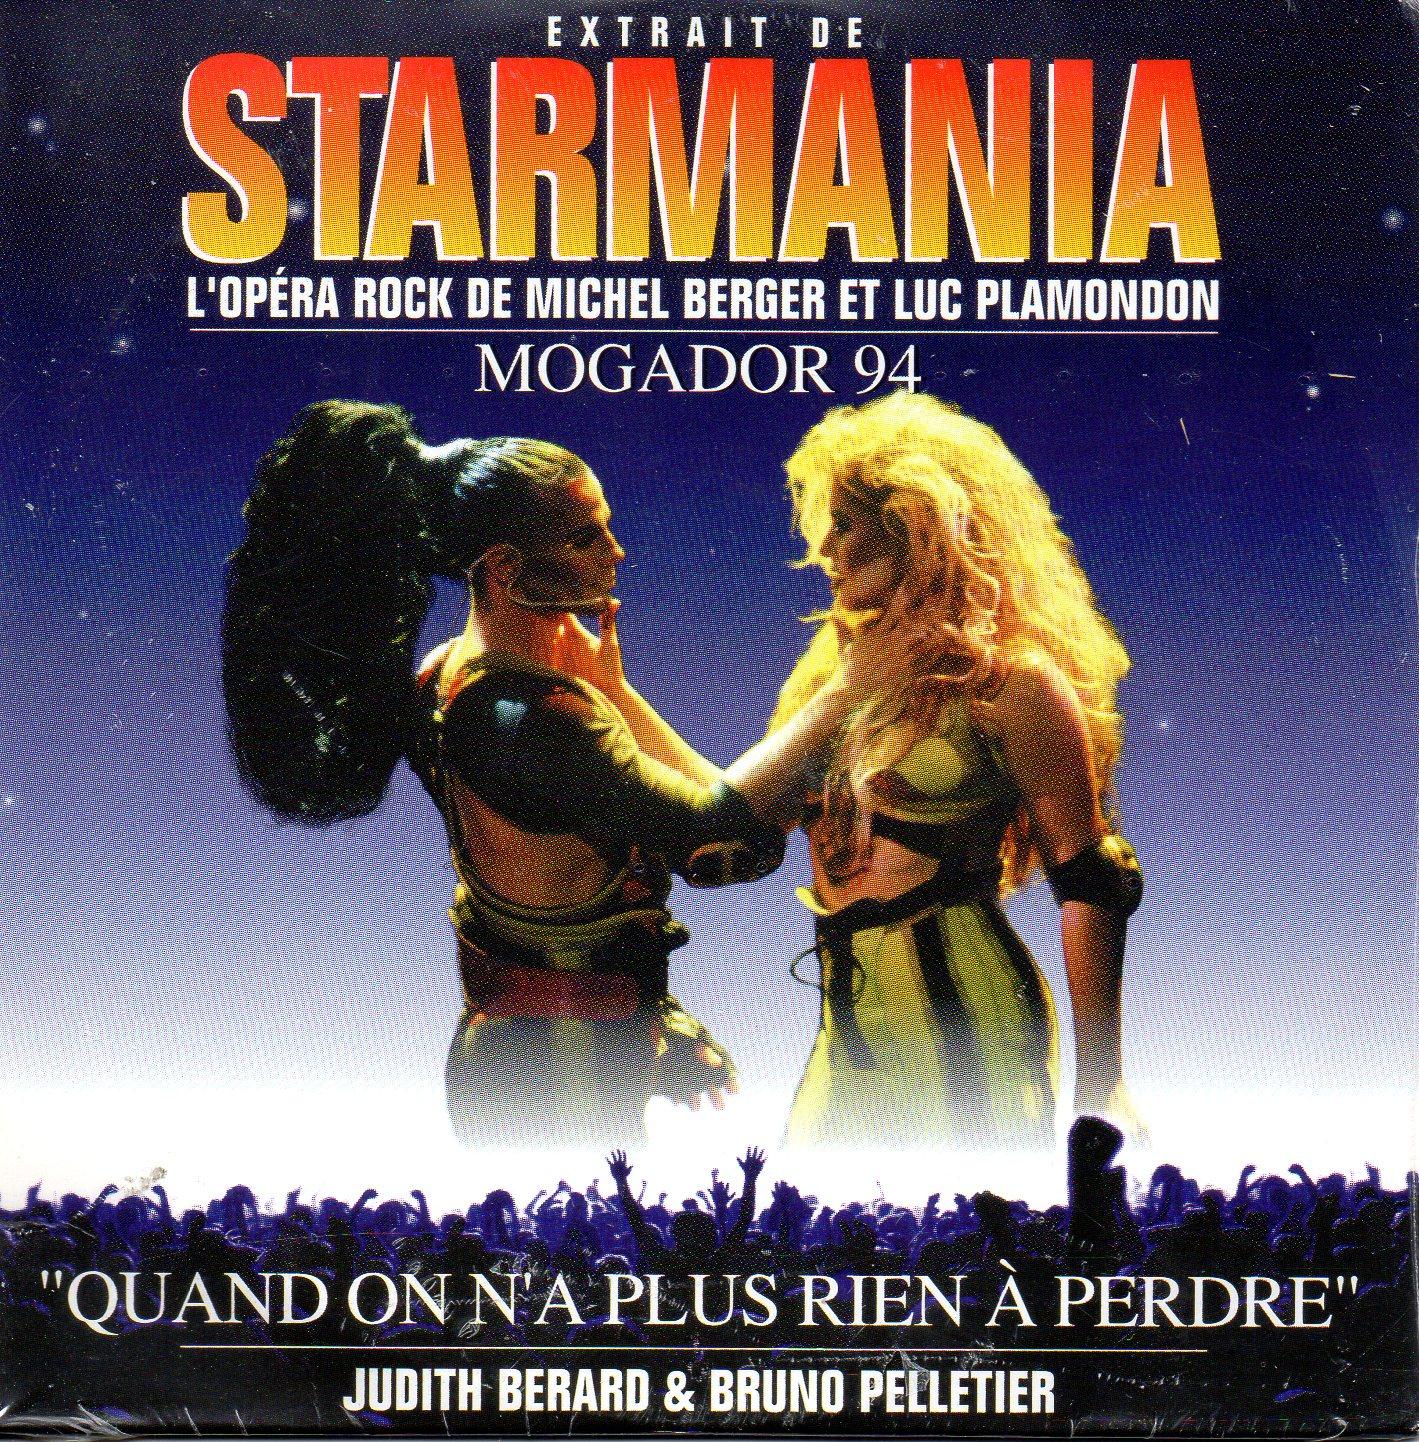 BRUNO PELLETIER & JUDITH BERARD - STARMANIA - Quand on n'a plus rien a perdre 2 Tracks CARD SLEEVE - CD single